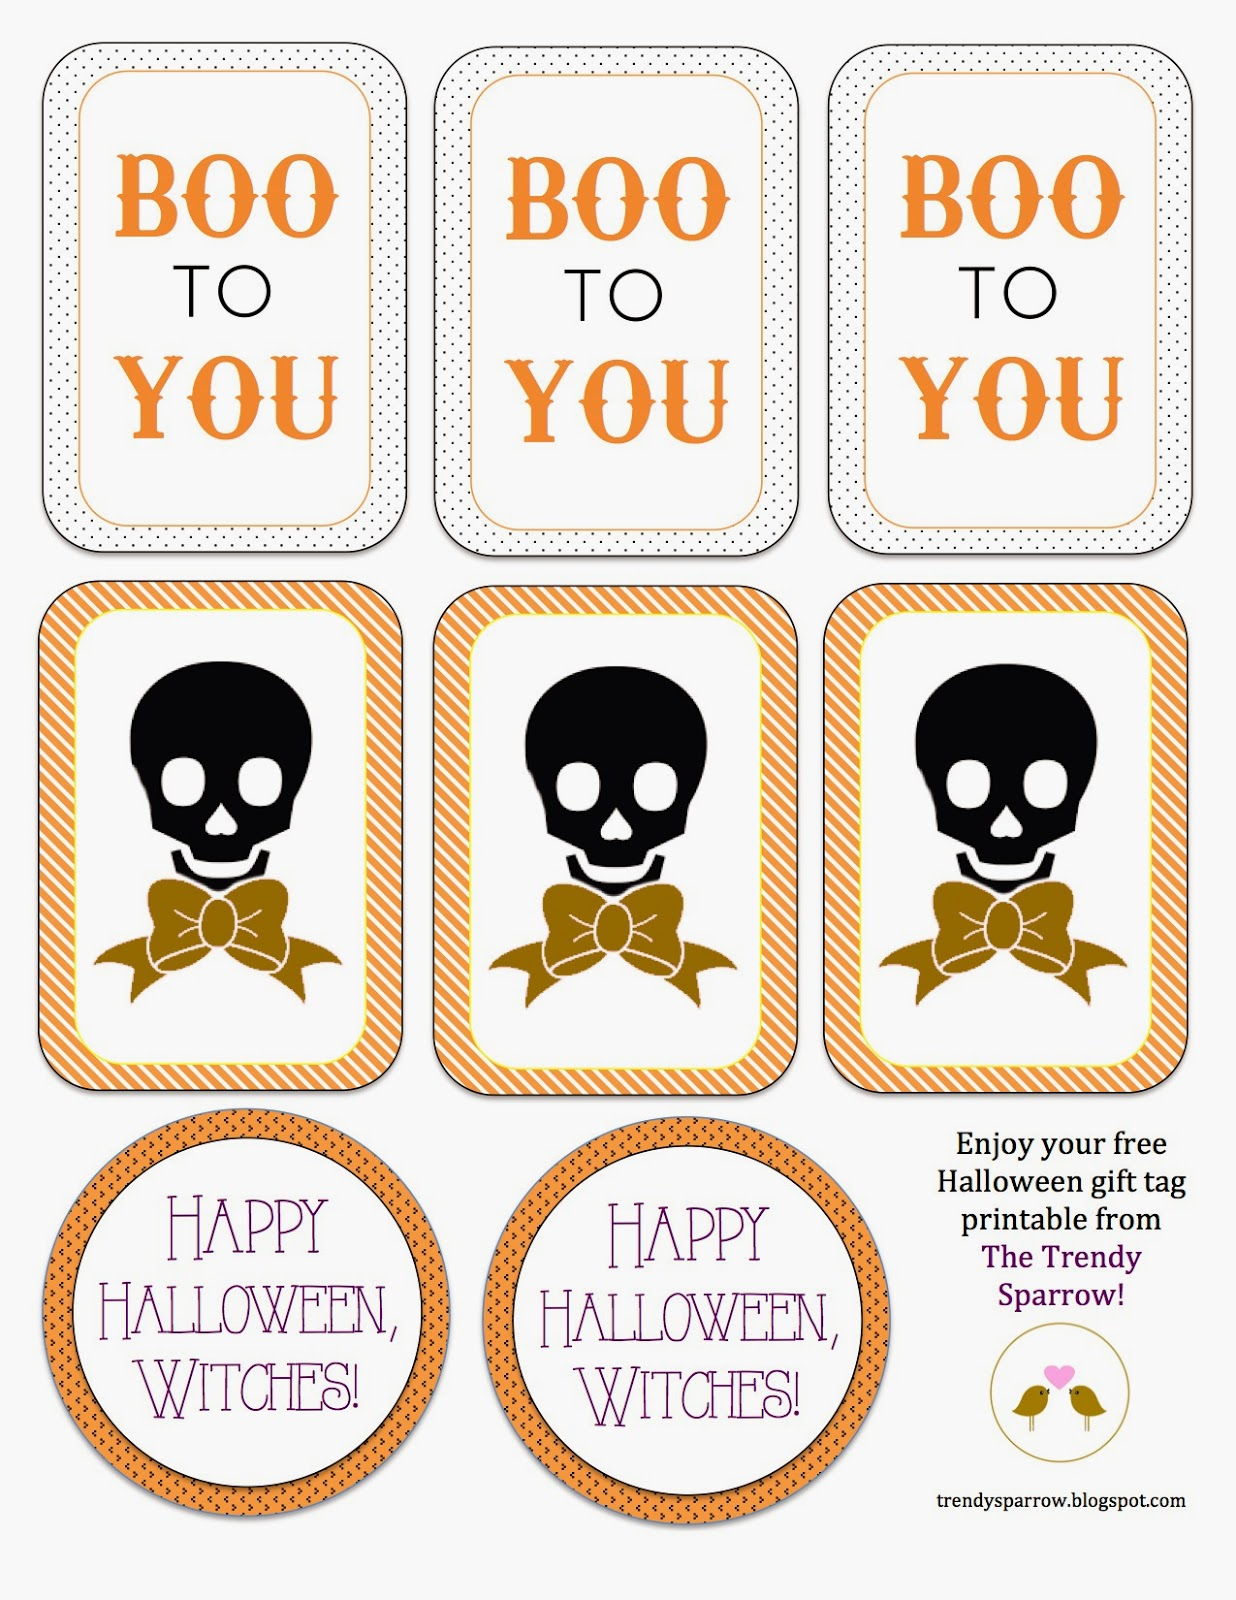 The Trendy Sparrow: Free Printable: Halloween Gift Tags - Free Printable Goodie Bag Tags